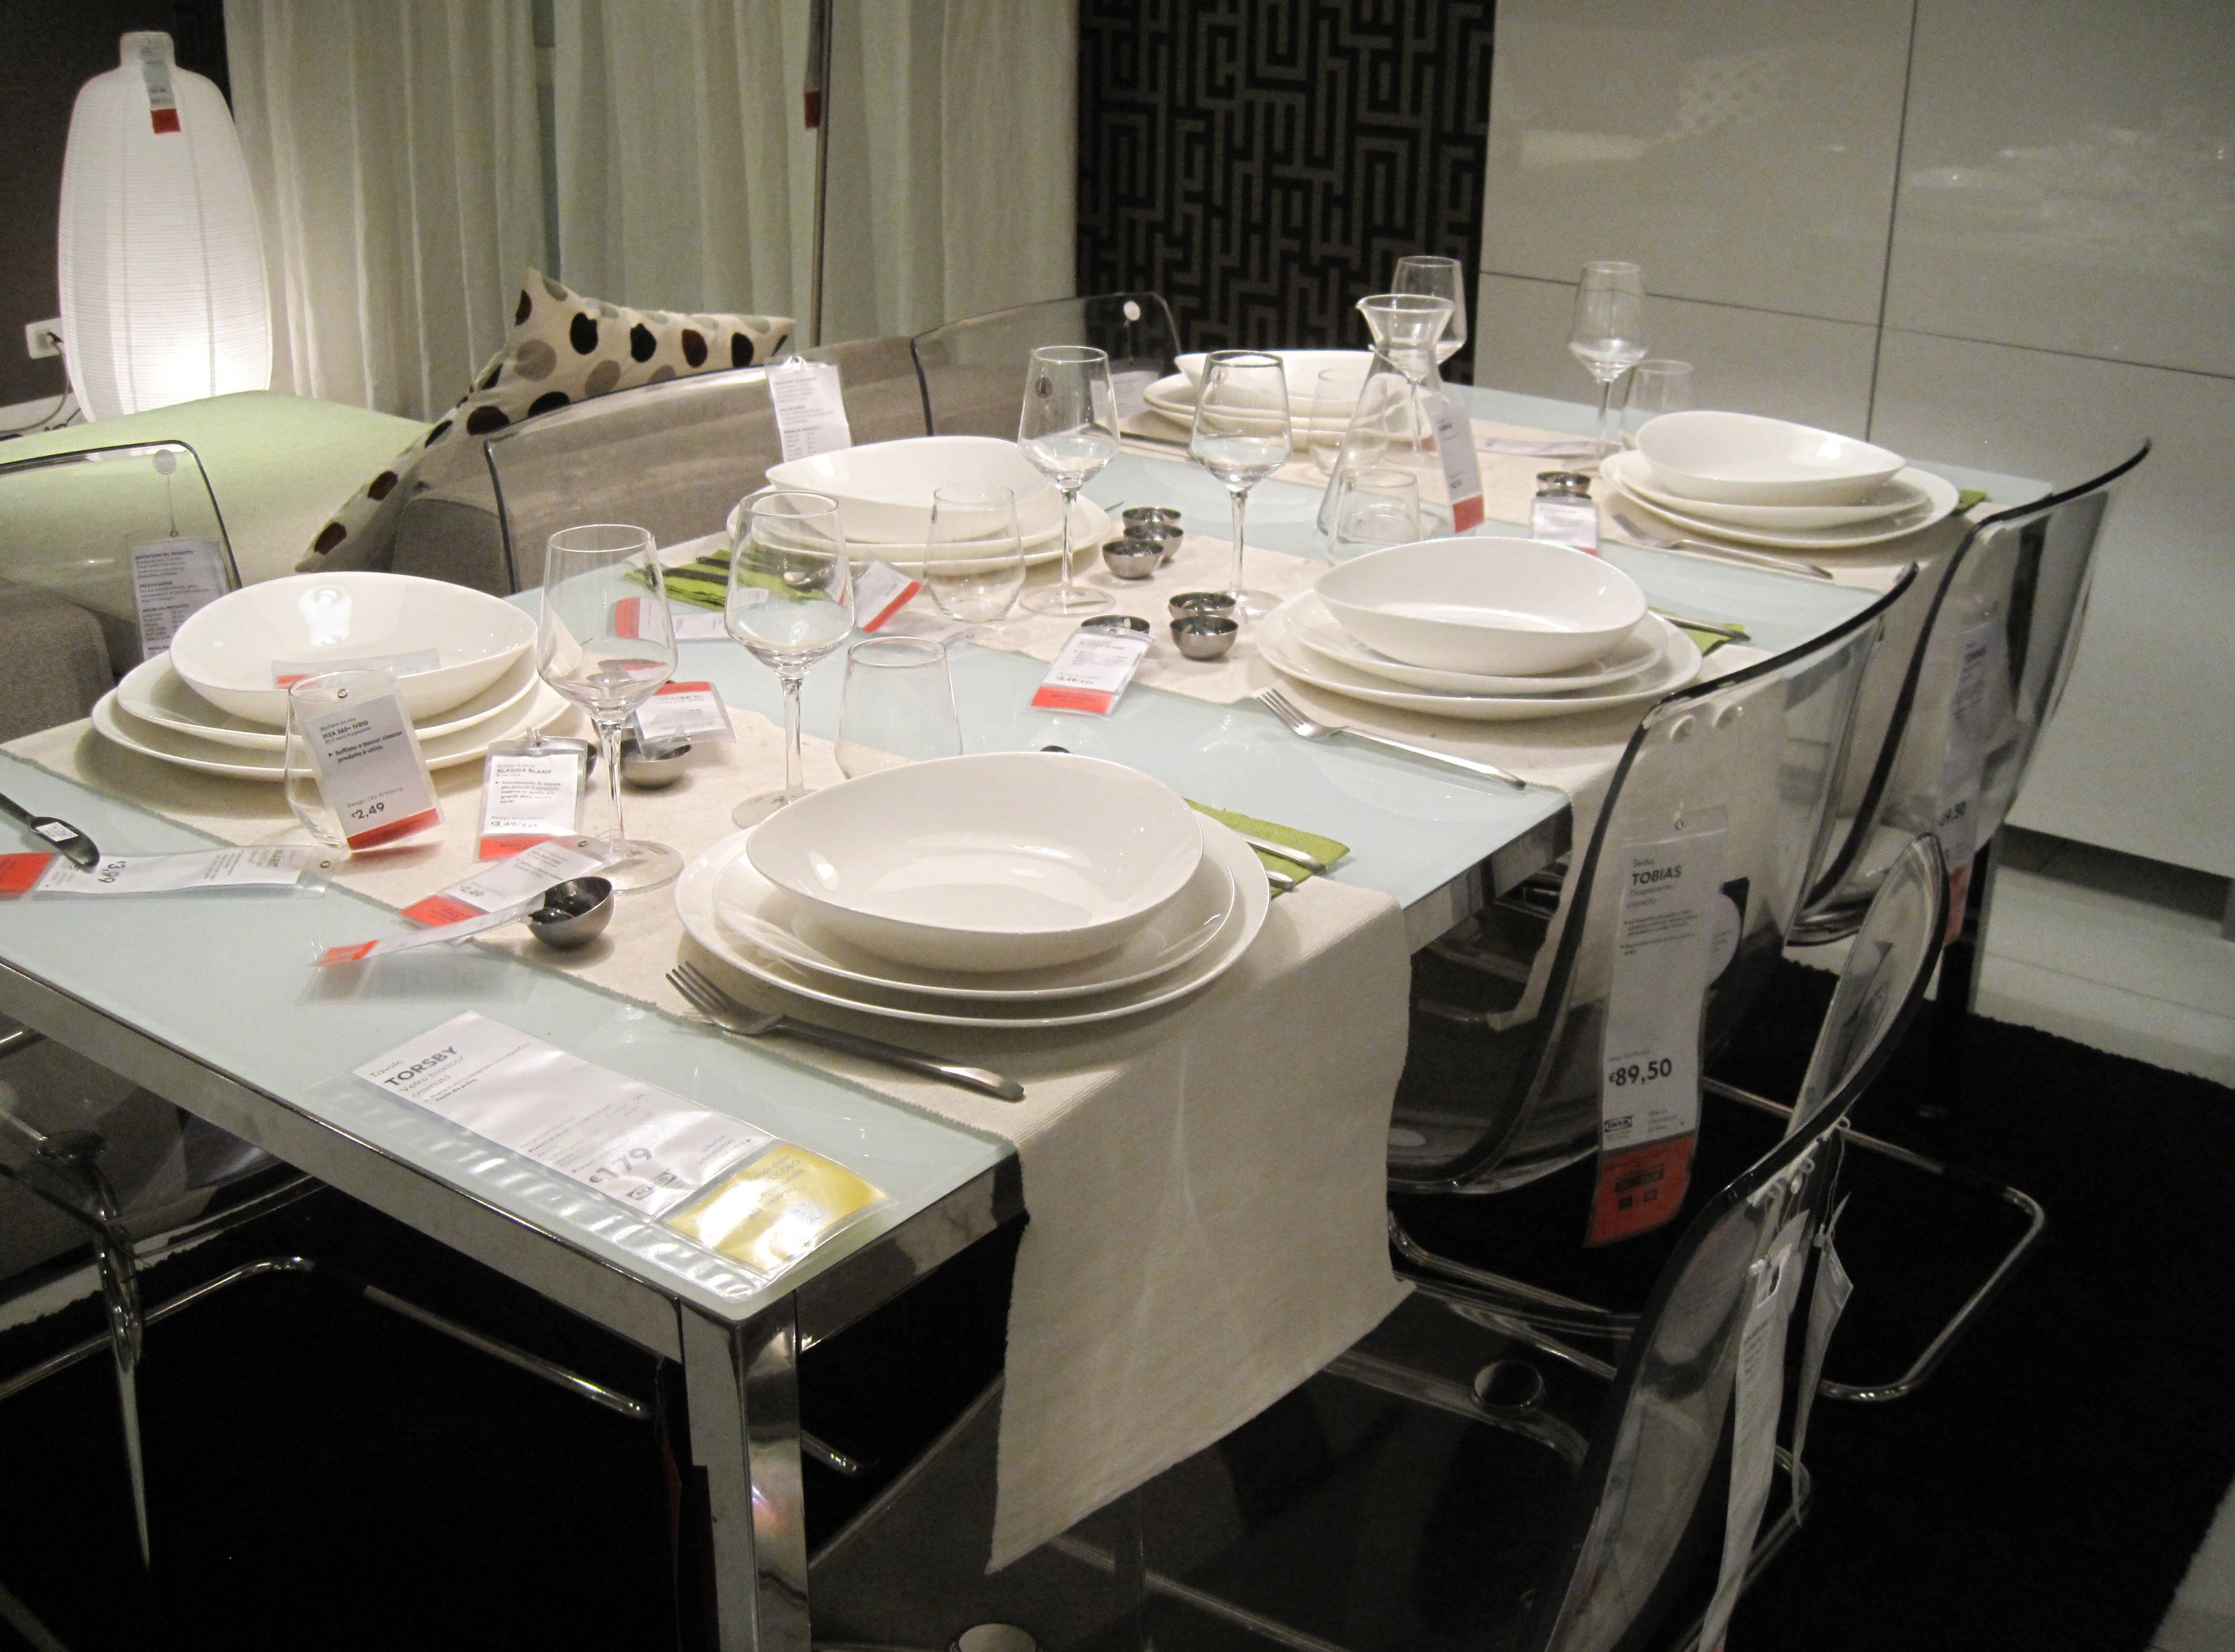 Matras 90x190 Ikea : Ikea molton top furniture bathroom mirror ikea mirrors store in